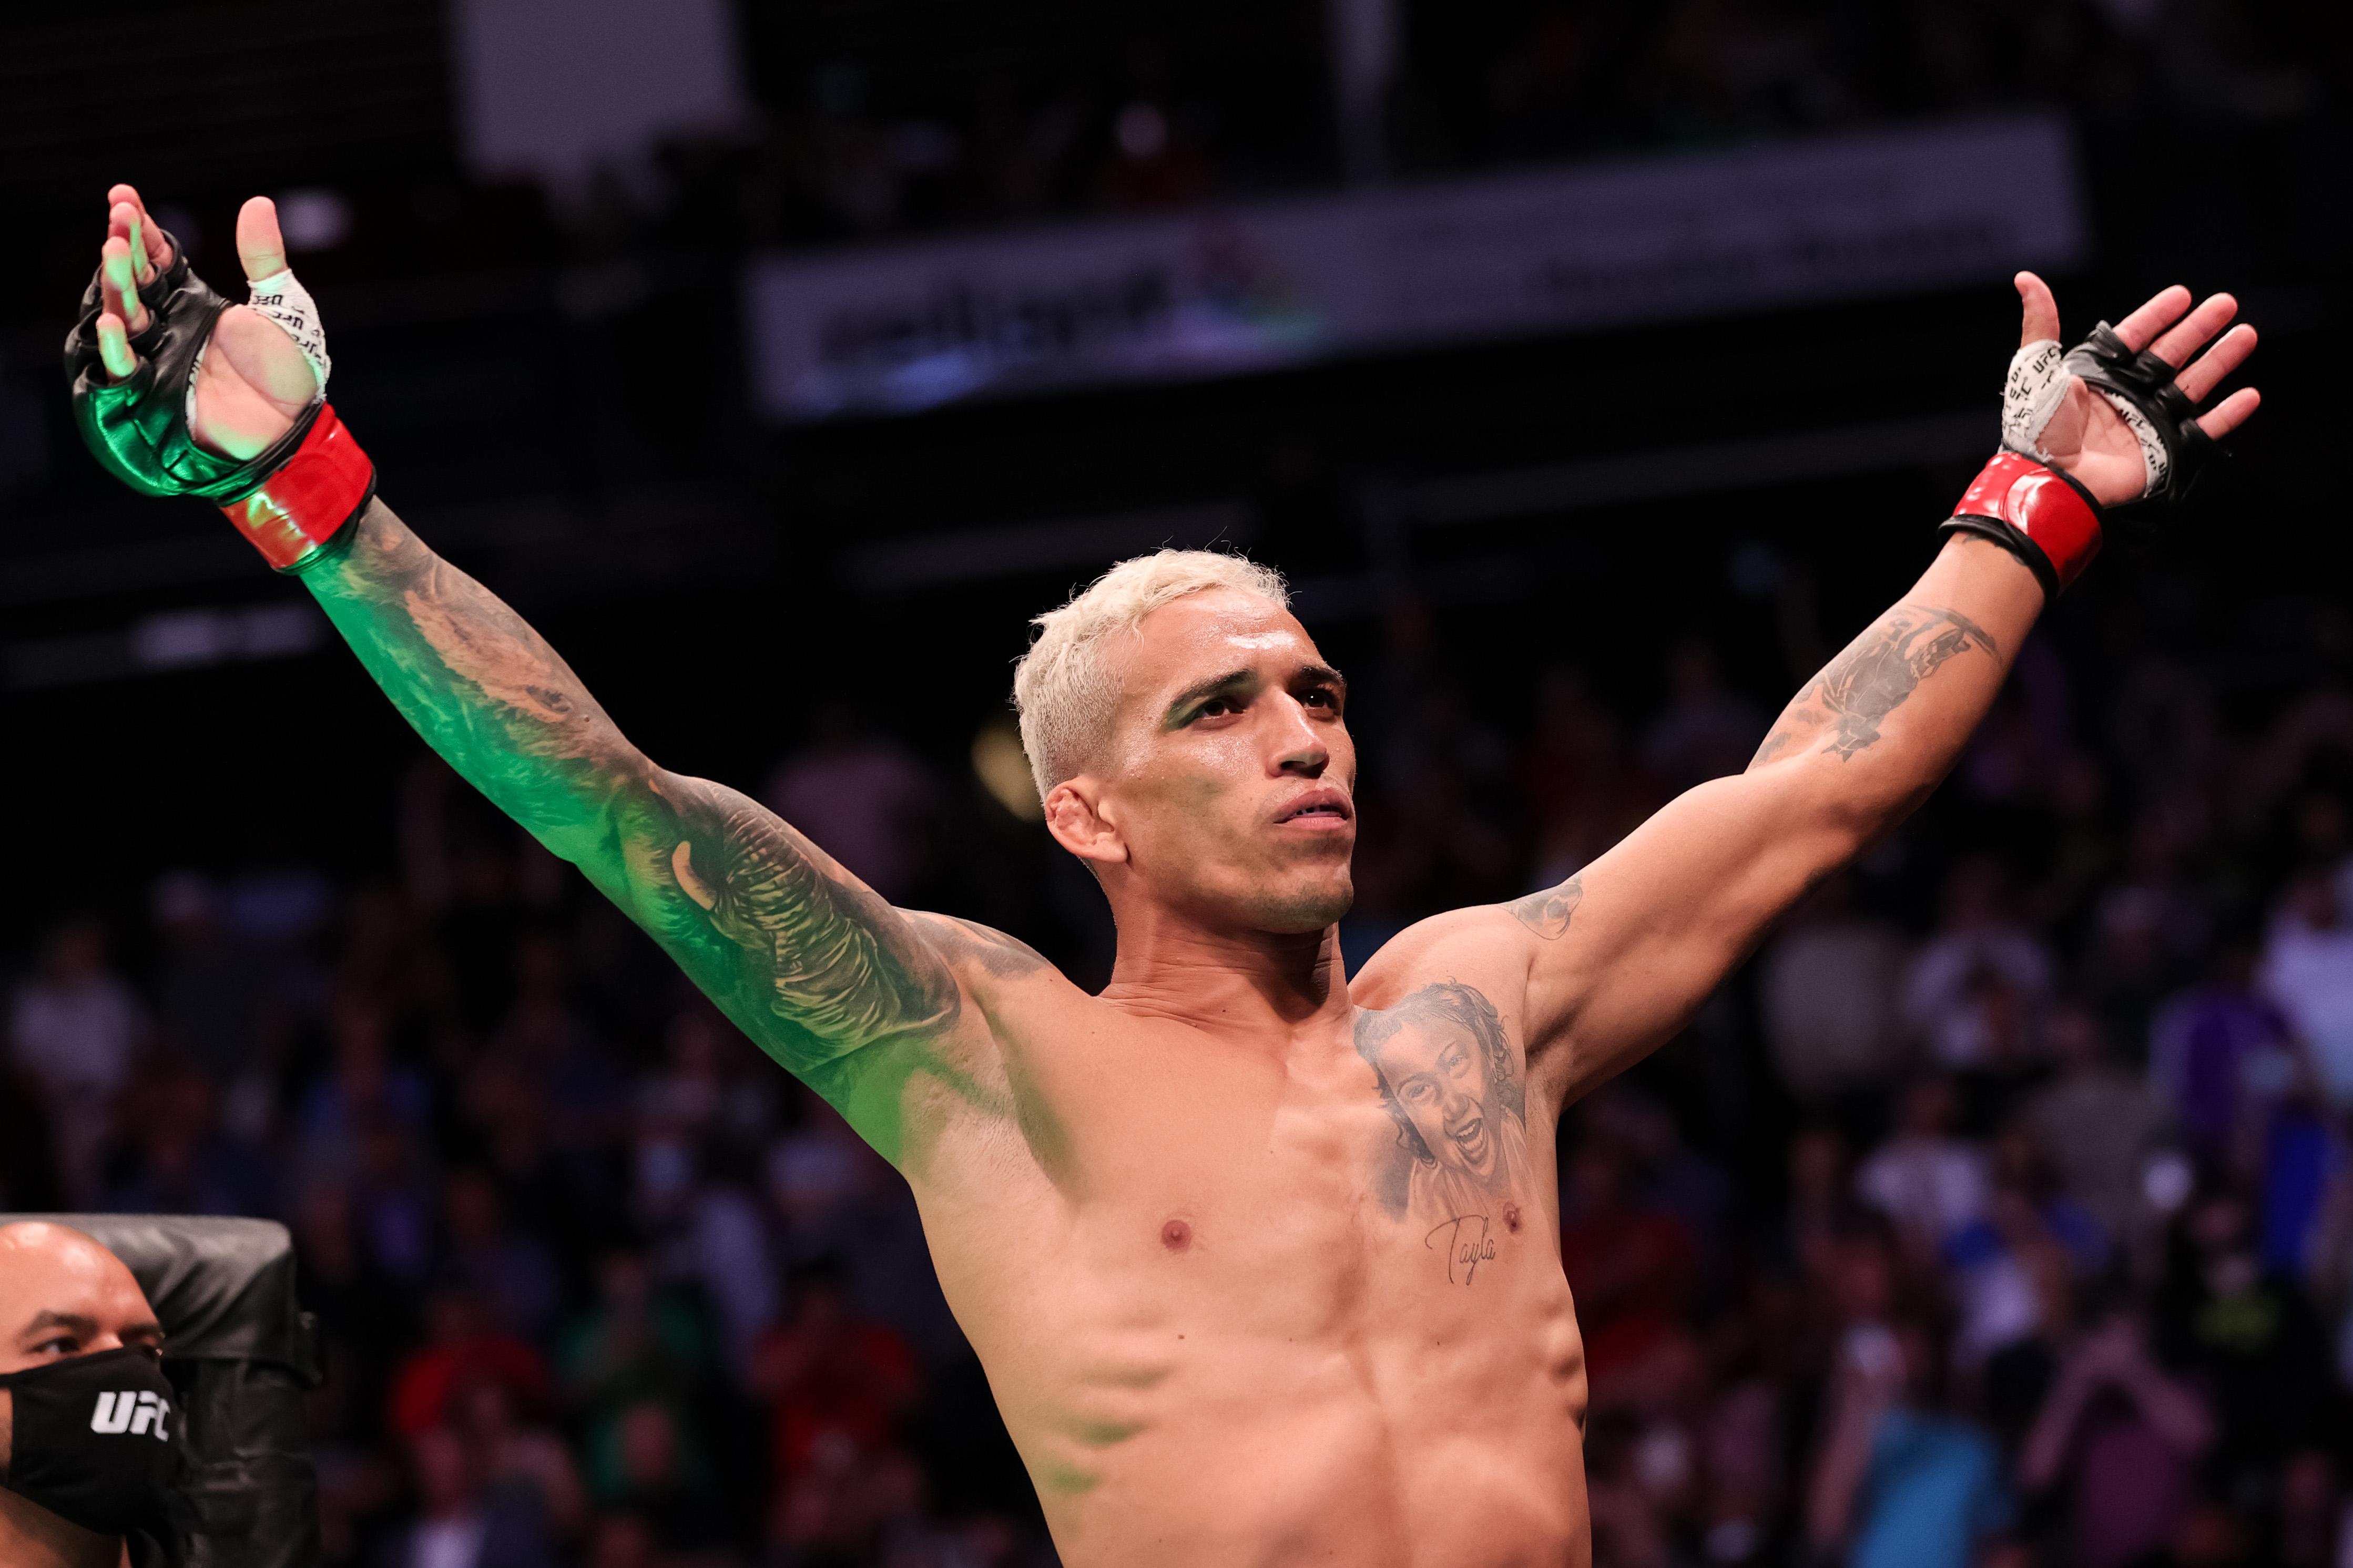 Charles Oliveira vs Michael Chandler at UFC 262